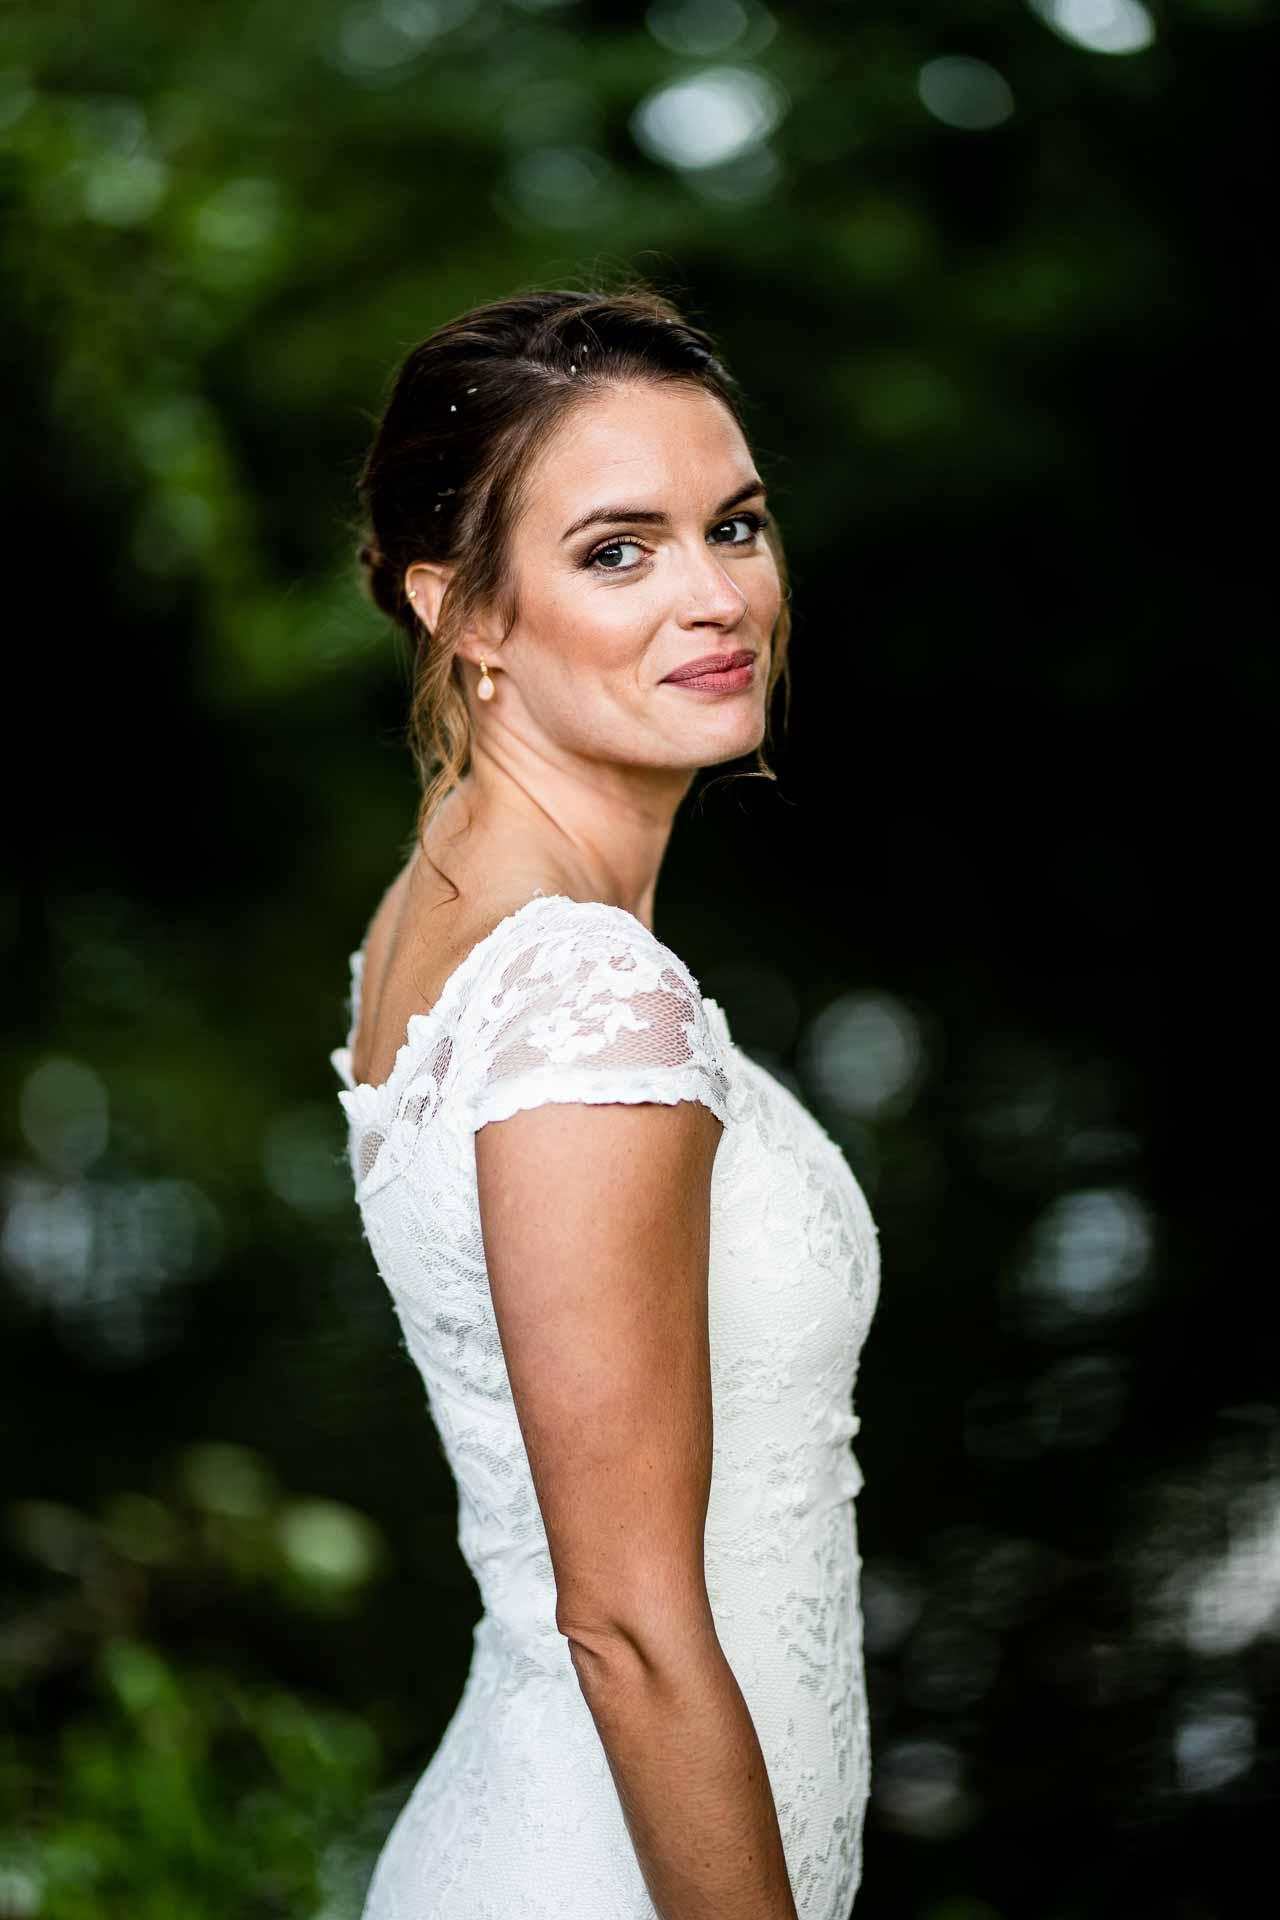 Mød en dygtig bryllup fotograf fra Aarhus